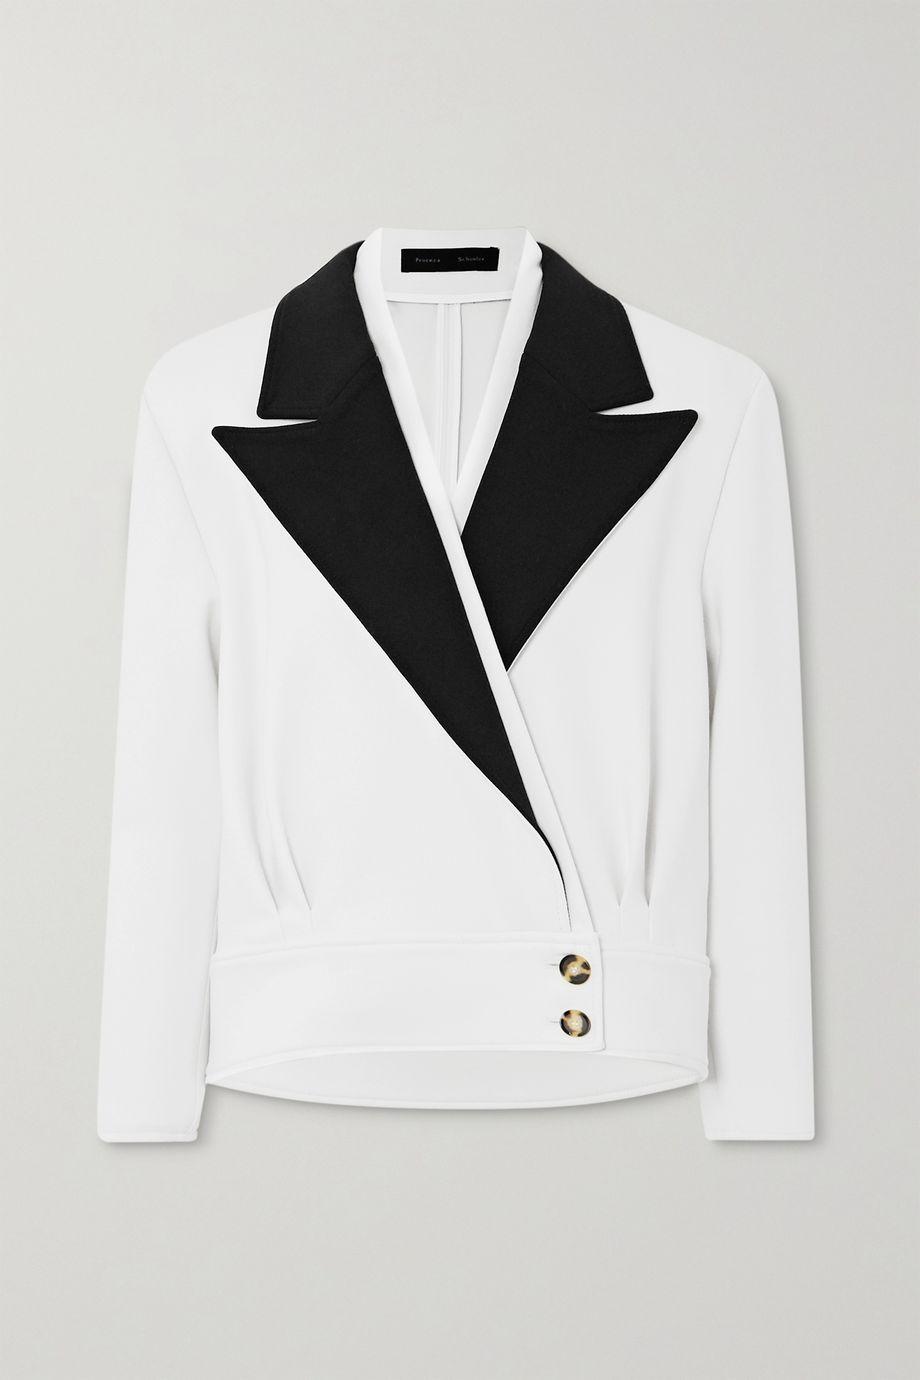 Proenza Schouler Two-tone wool-blend blazer